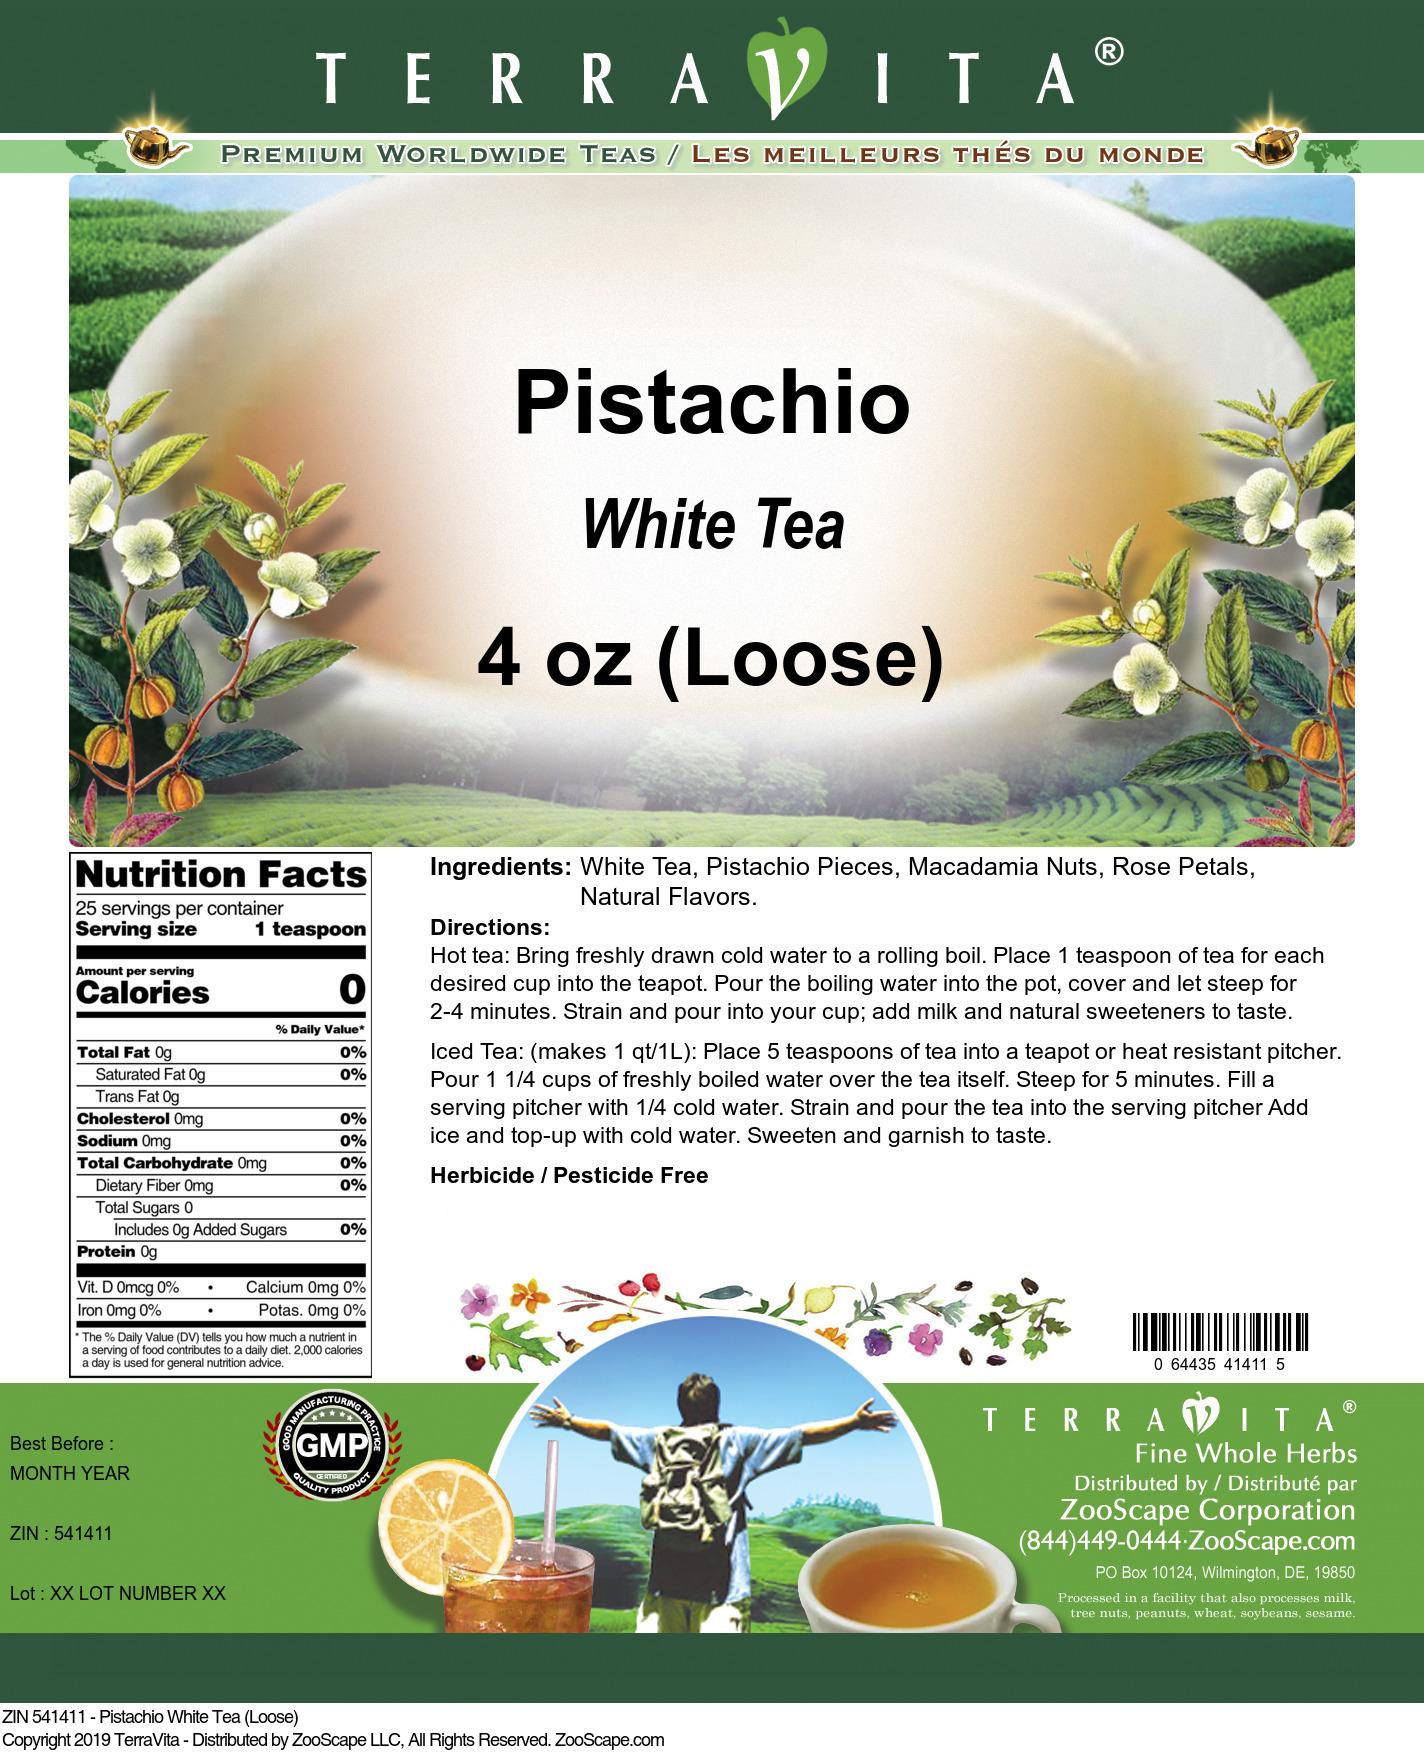 Pistachio White Tea (Loose)